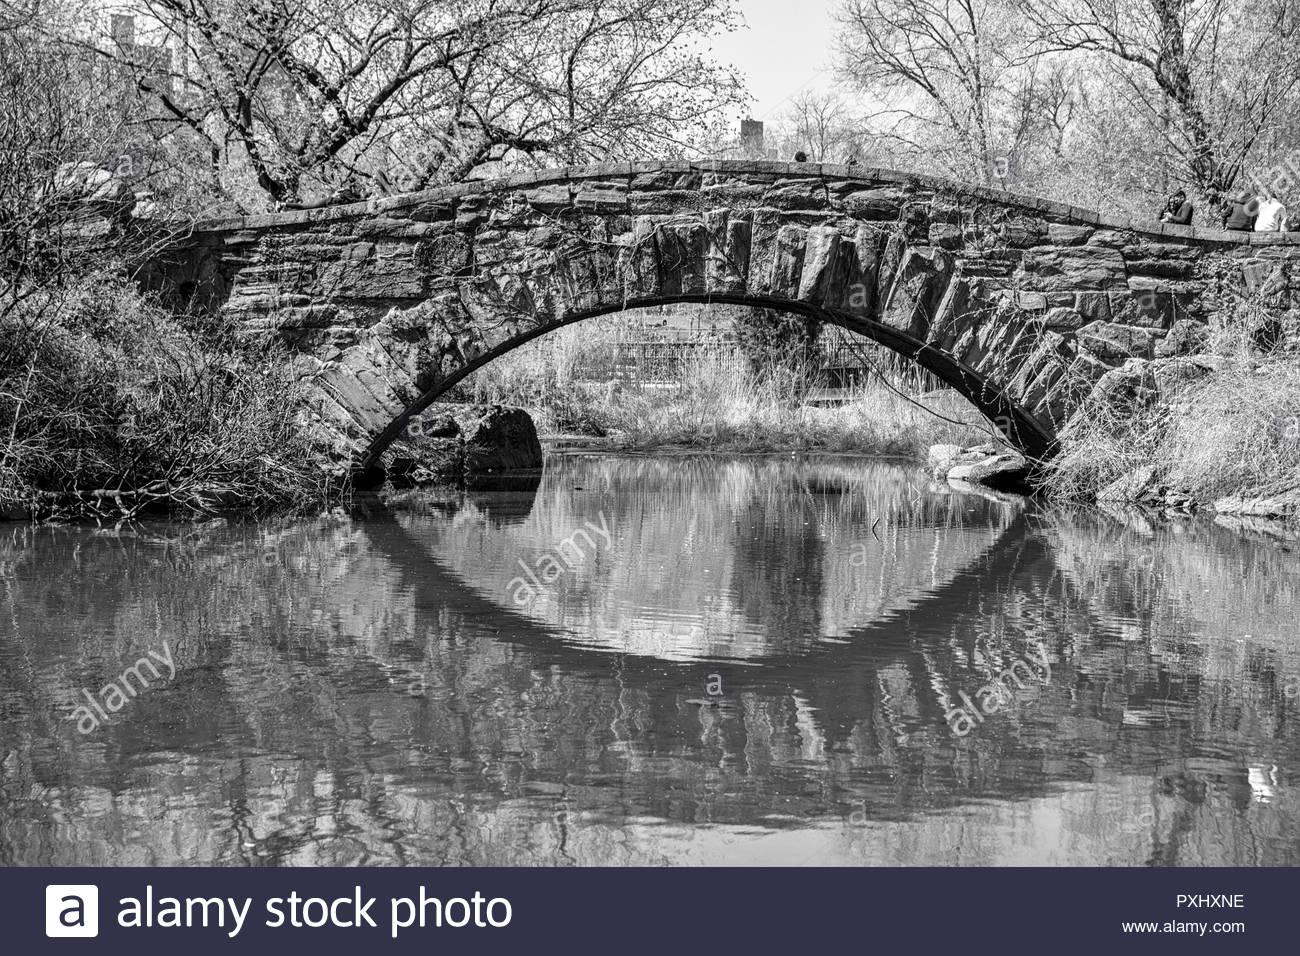 Black and White of Gapstow Bridge in New York City - Stock Image